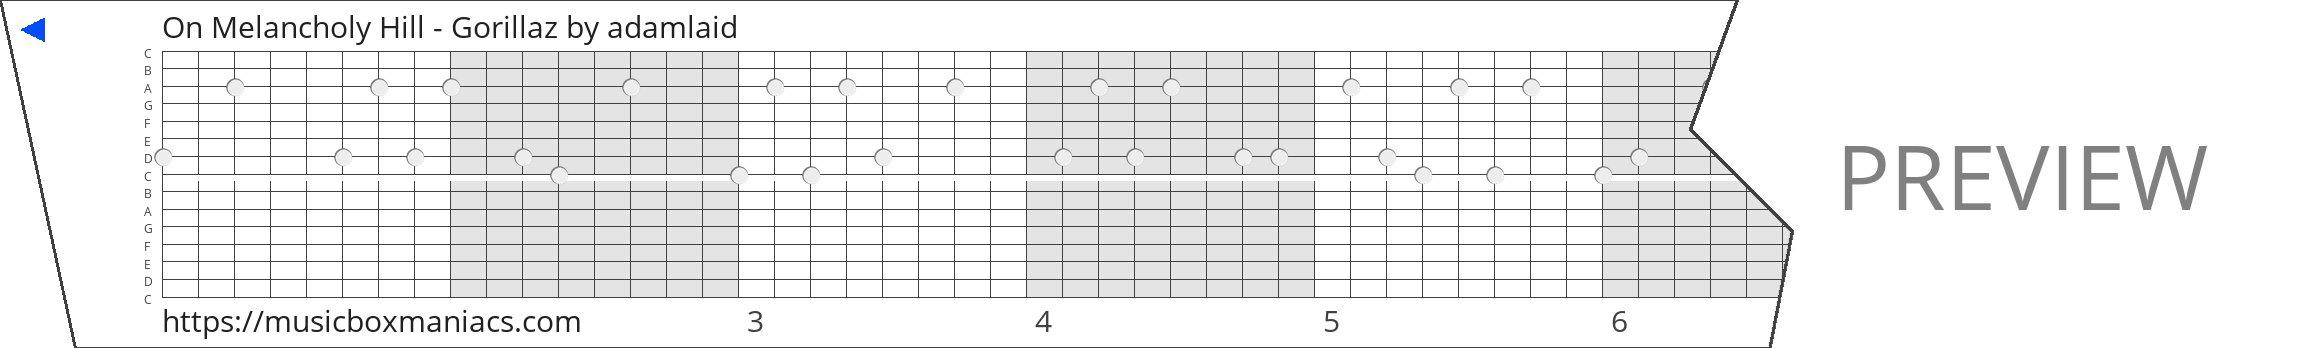 On Melancholy Hill - Gorillaz 15 note music box paper strip